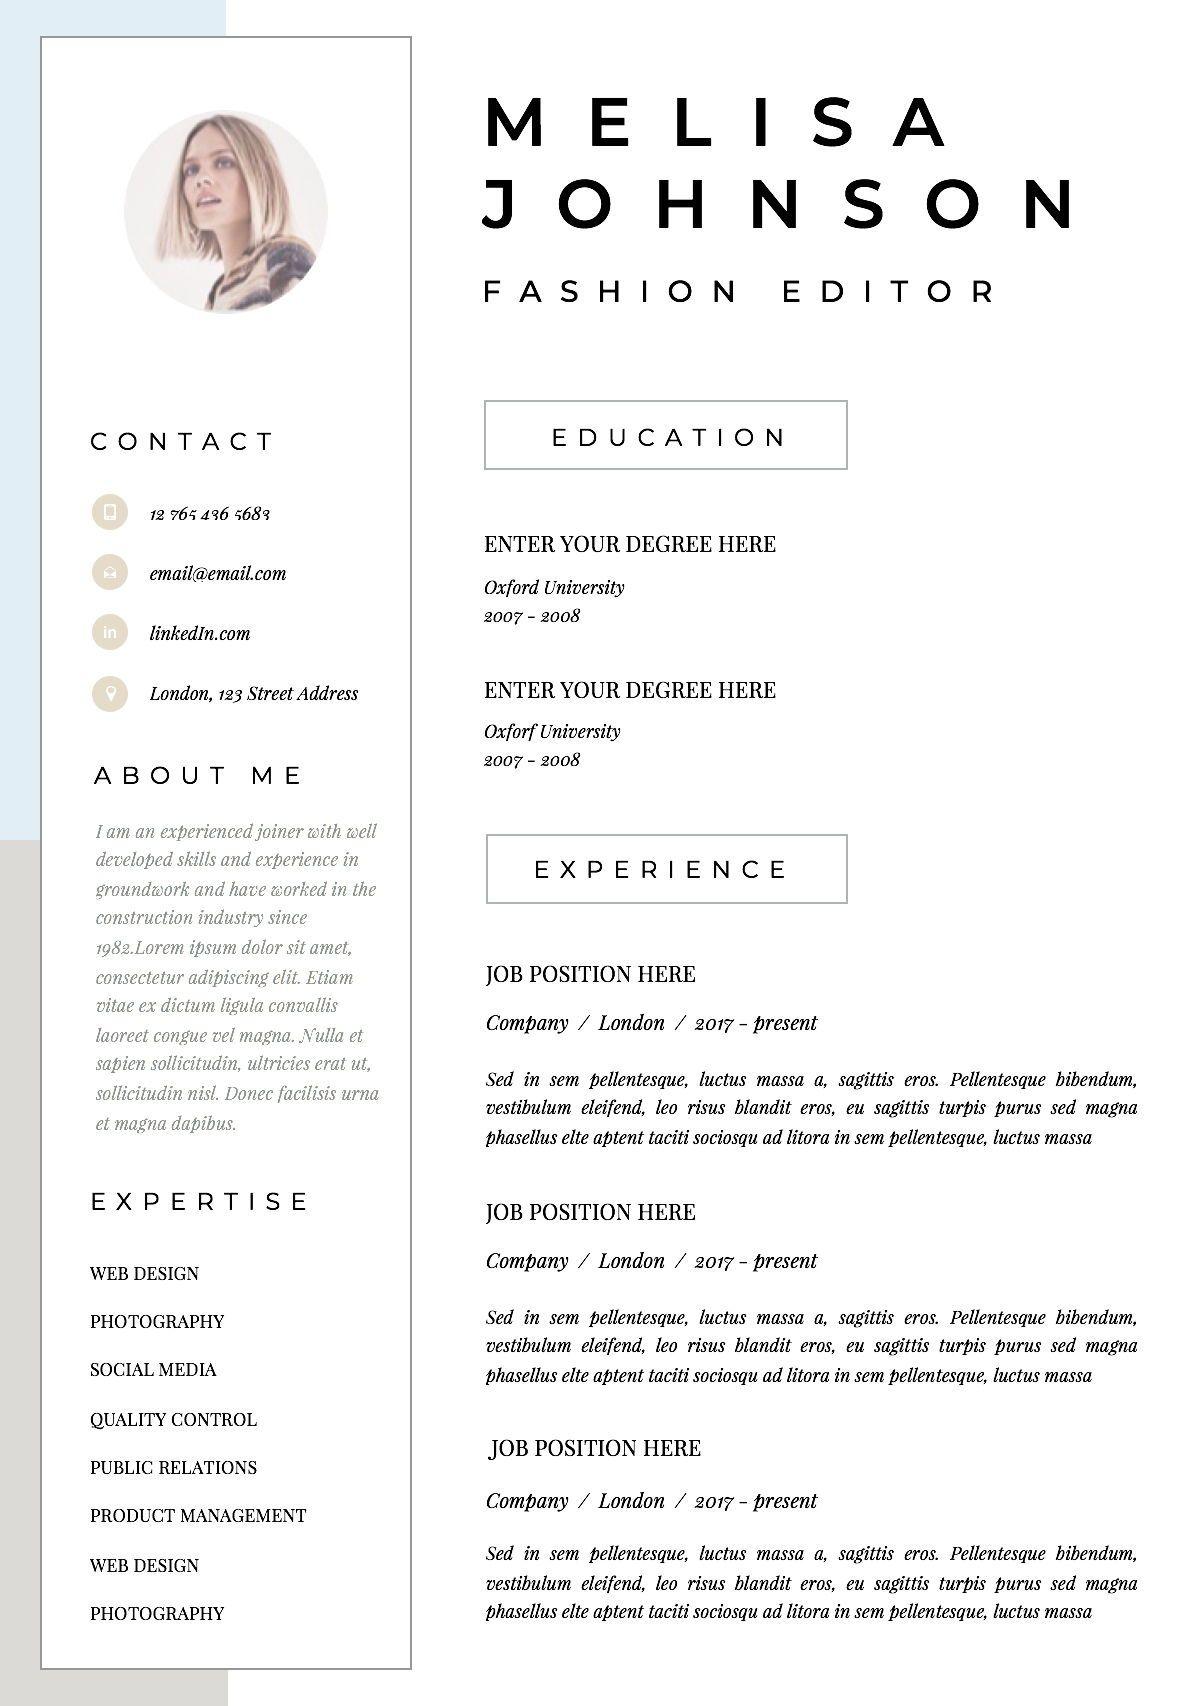 Resume Template | CV Template | Resume | CV design | Teacher resume | Curriculum Vitae | CV Instant download Resume | cv | Resume Templates